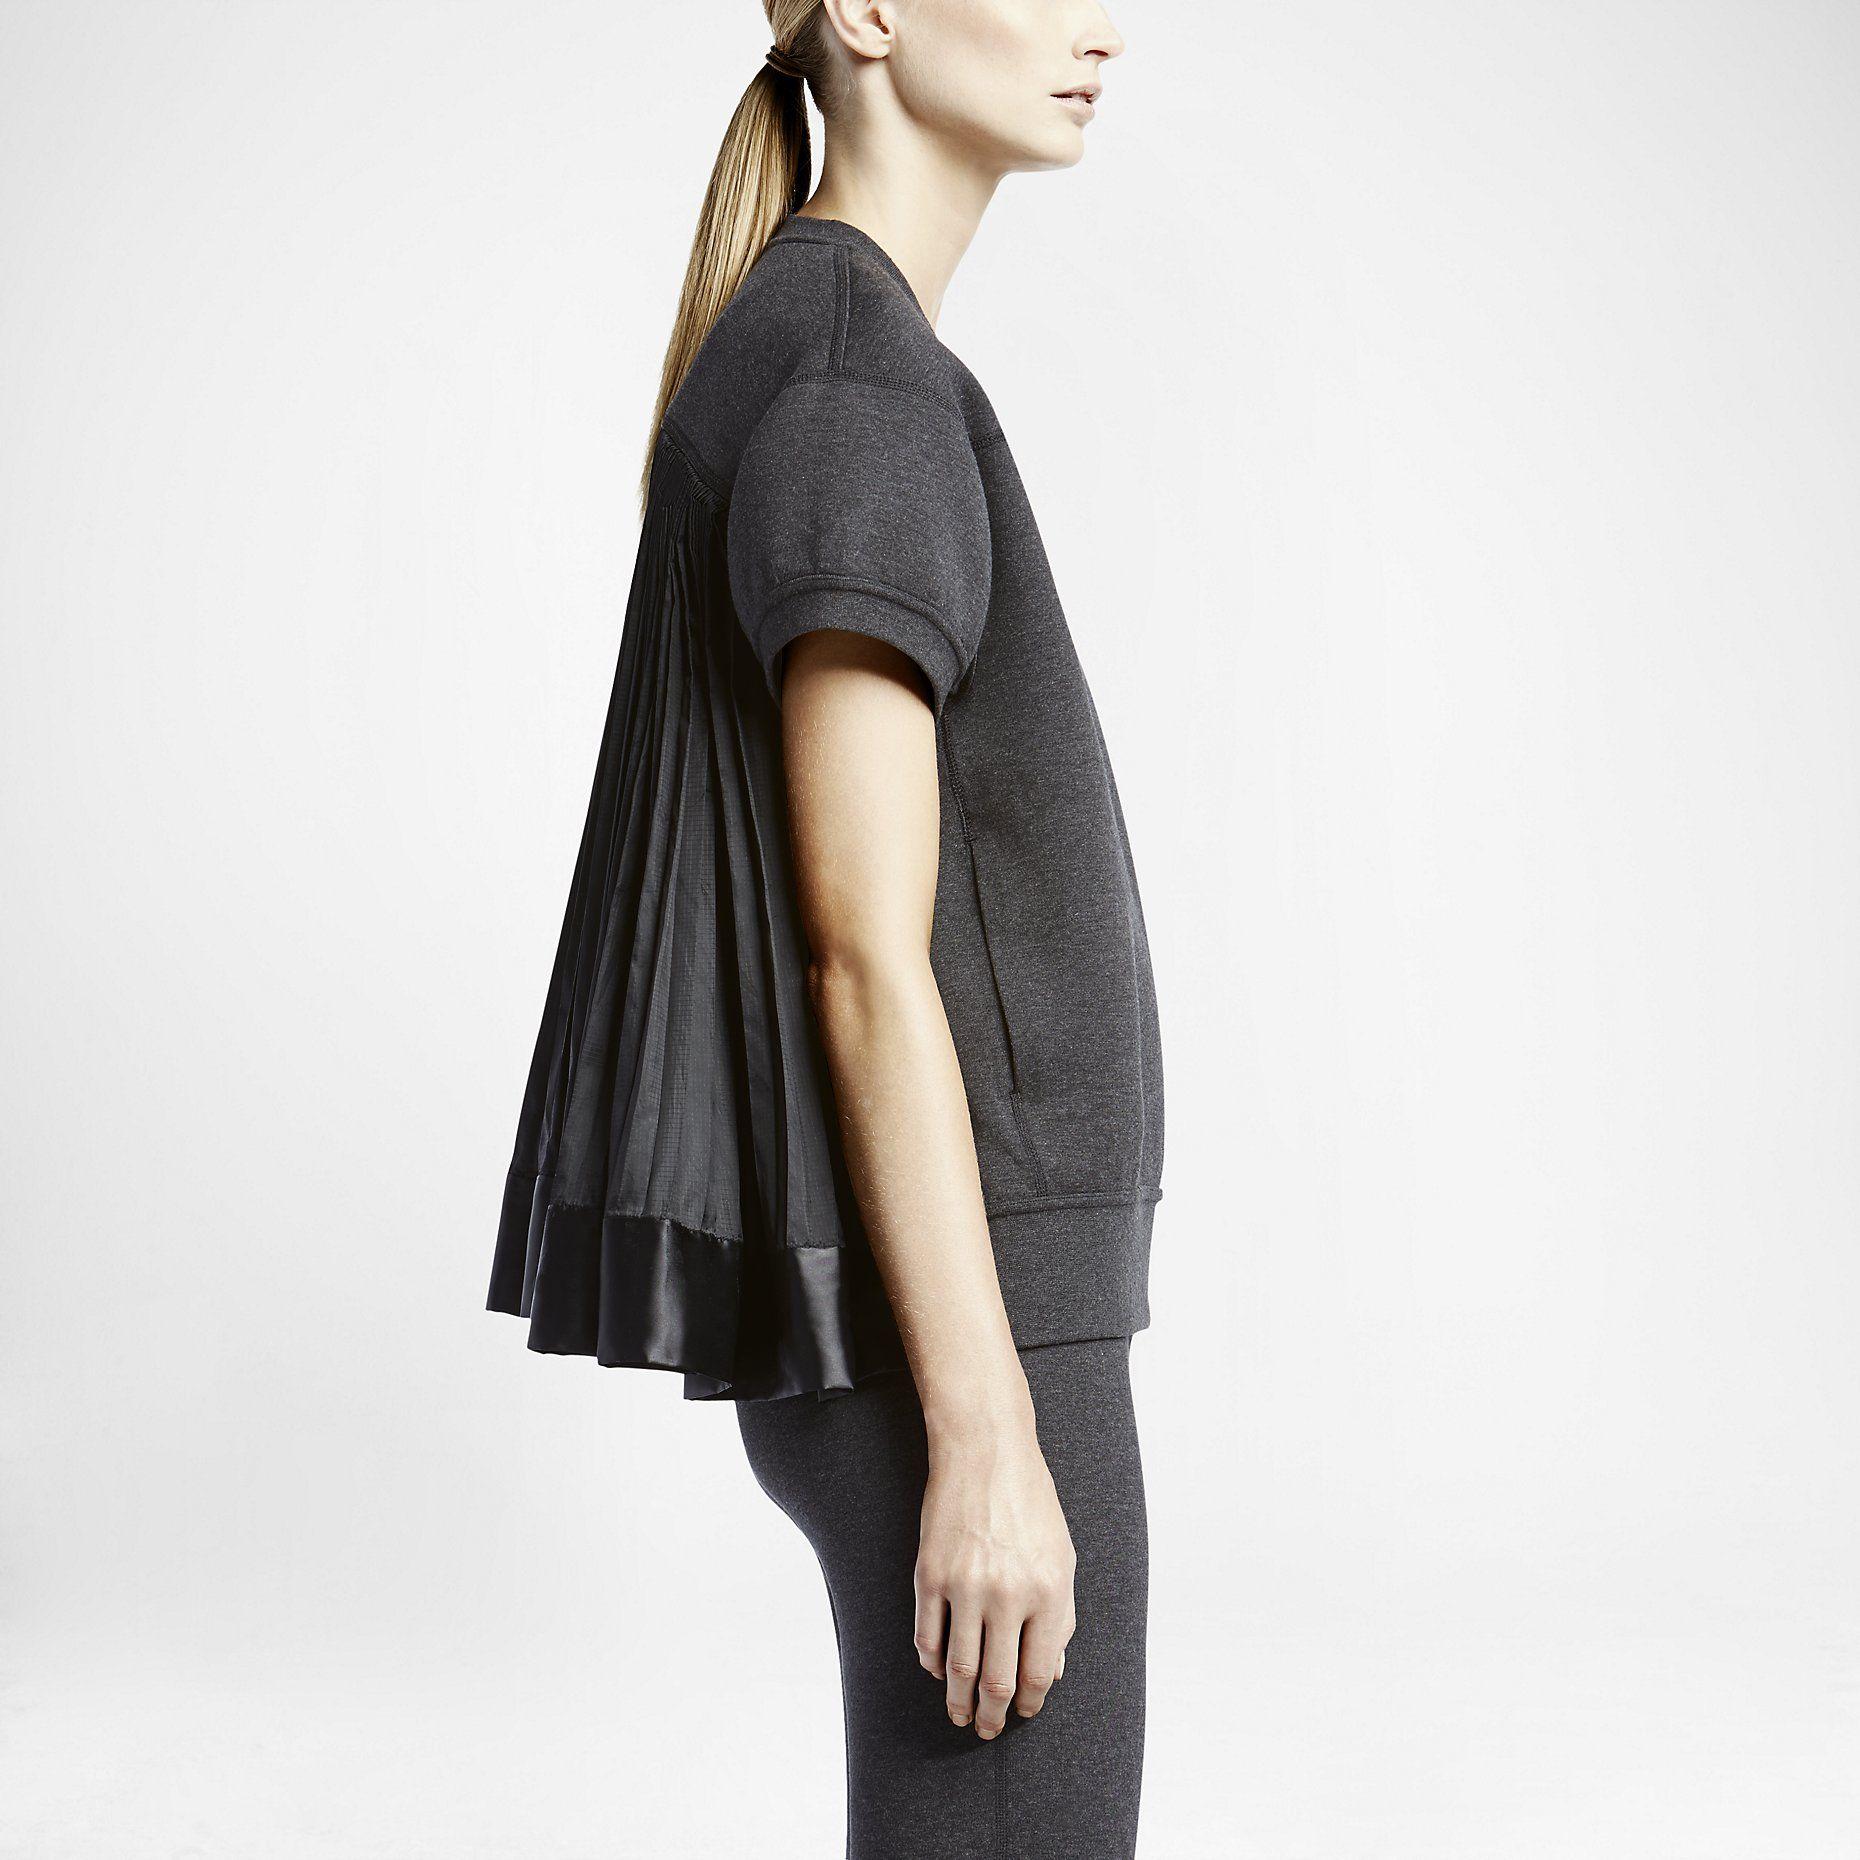 NikeLab x sacai Tech Fleece ShortSleeve Crew Women's